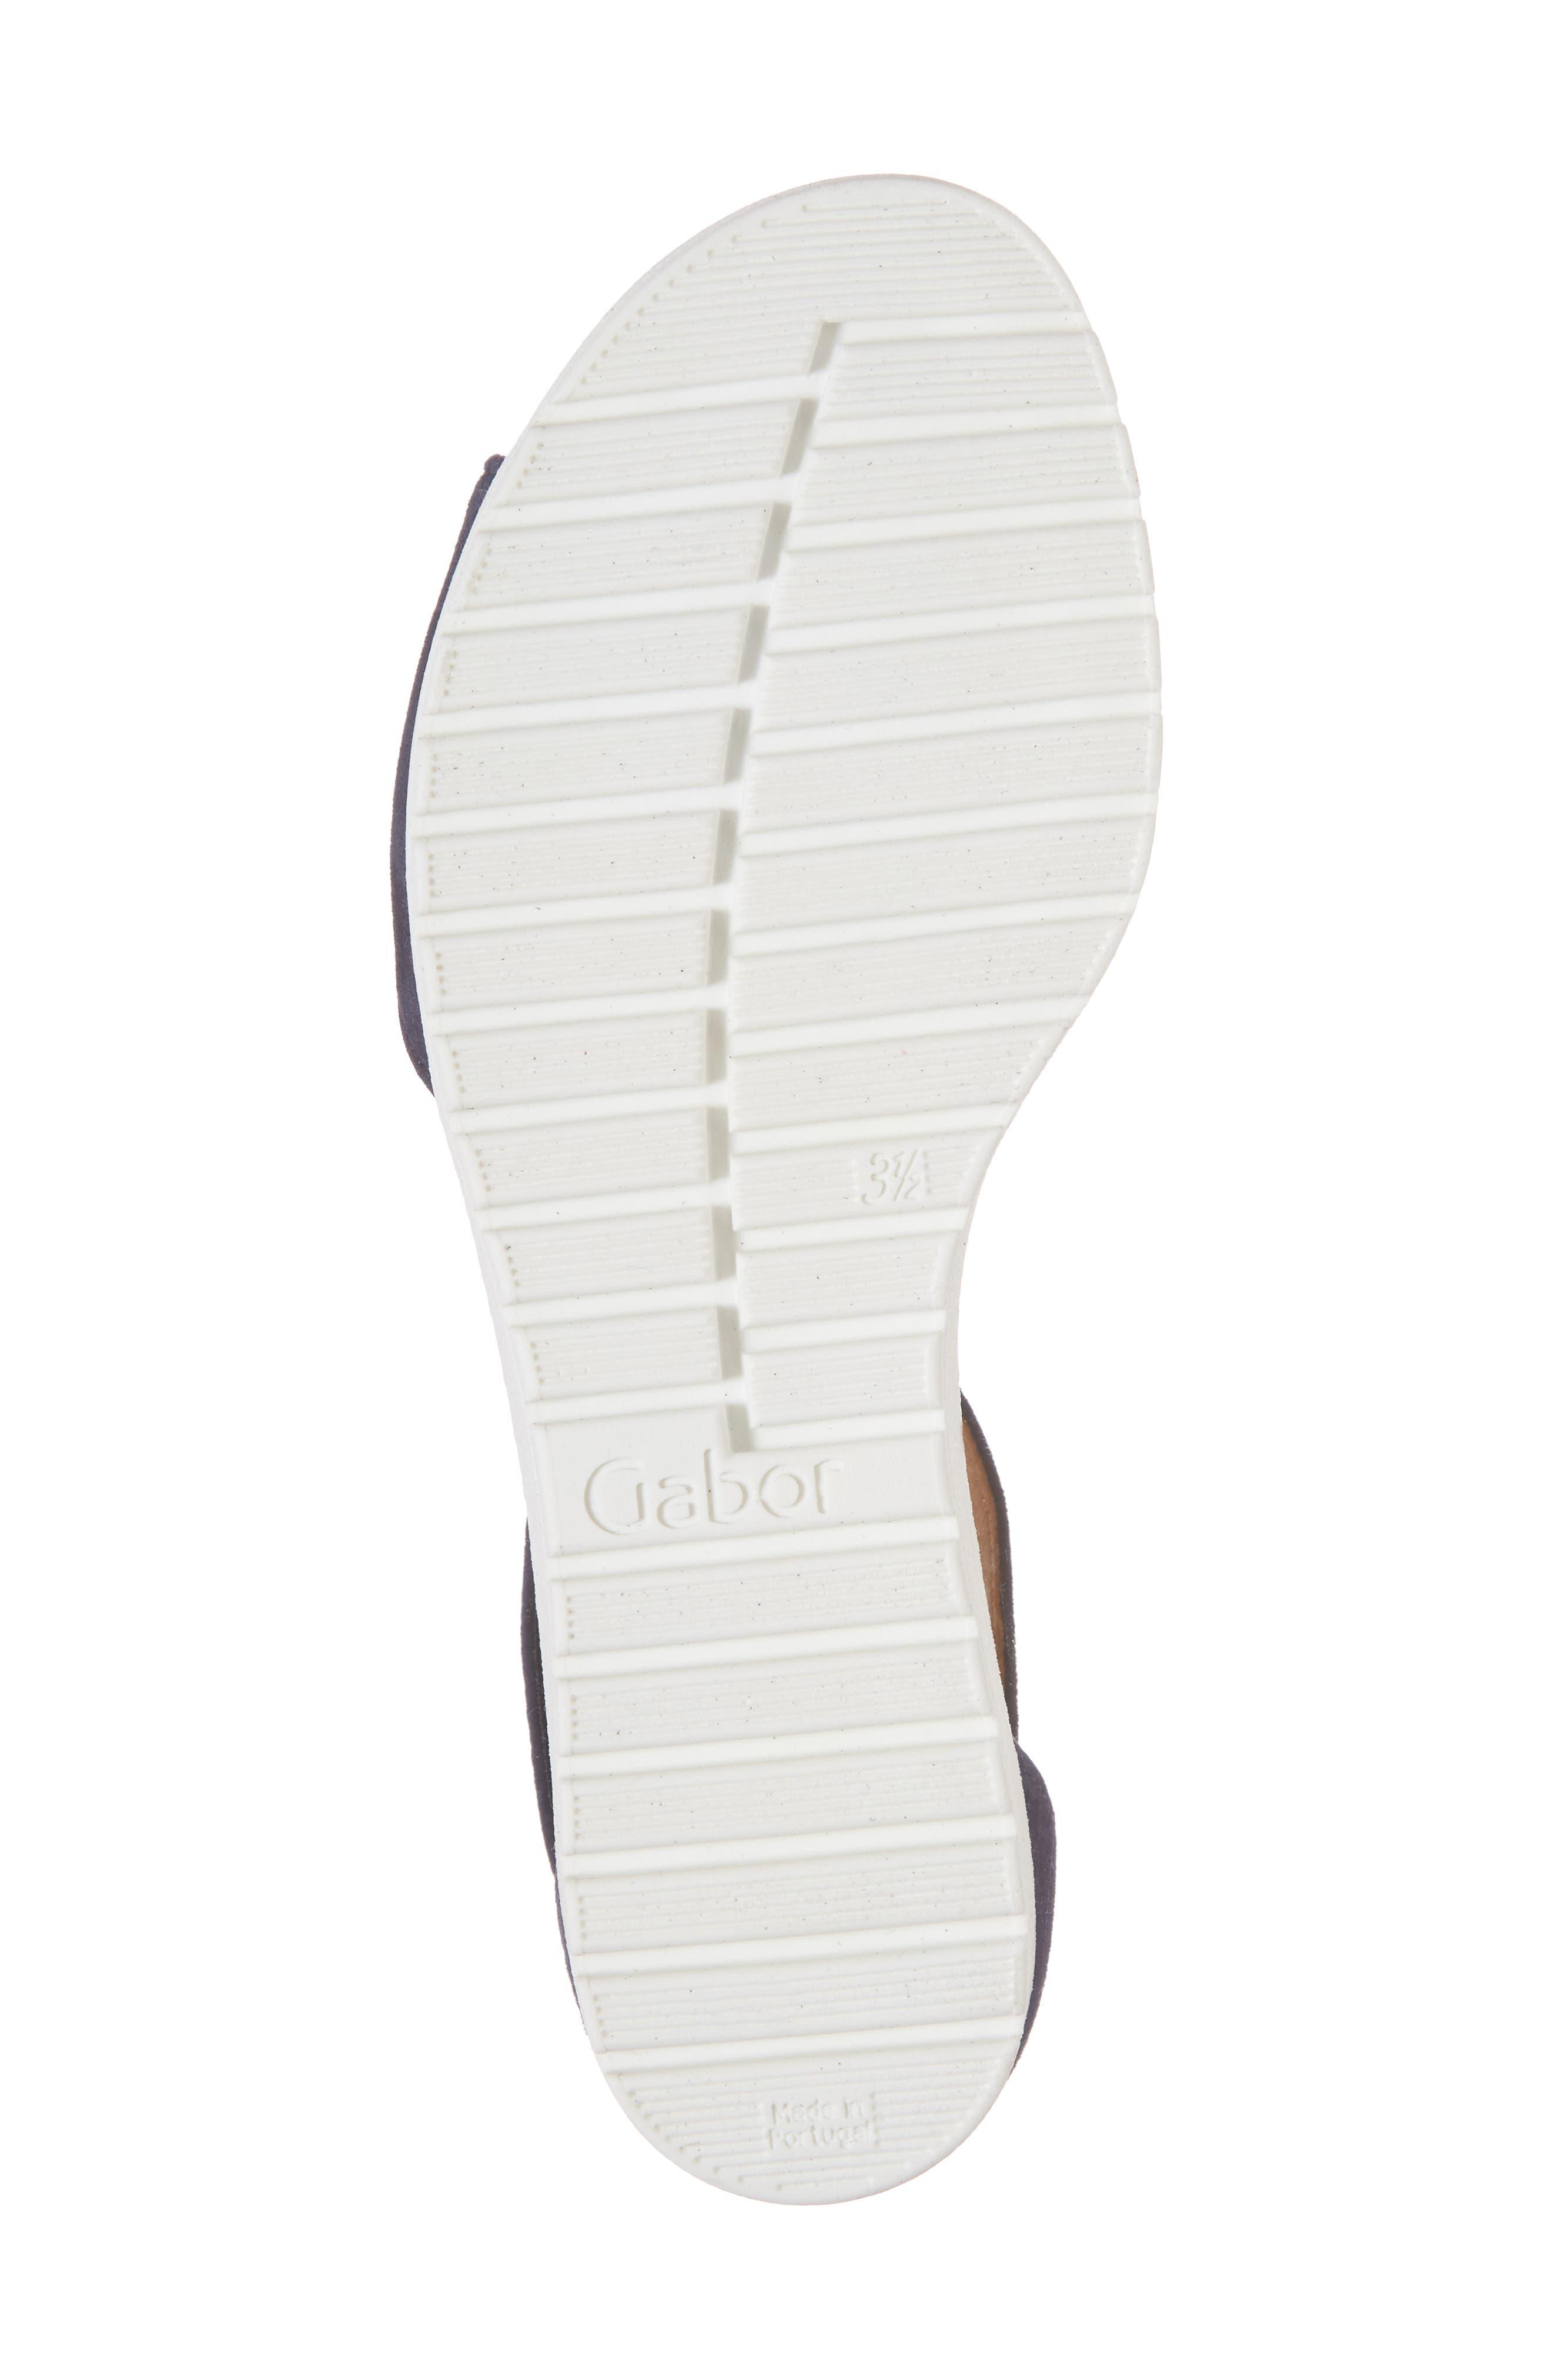 Ankle Strap Sandal,                             Alternate thumbnail 6, color,                             BLUE SUEDE